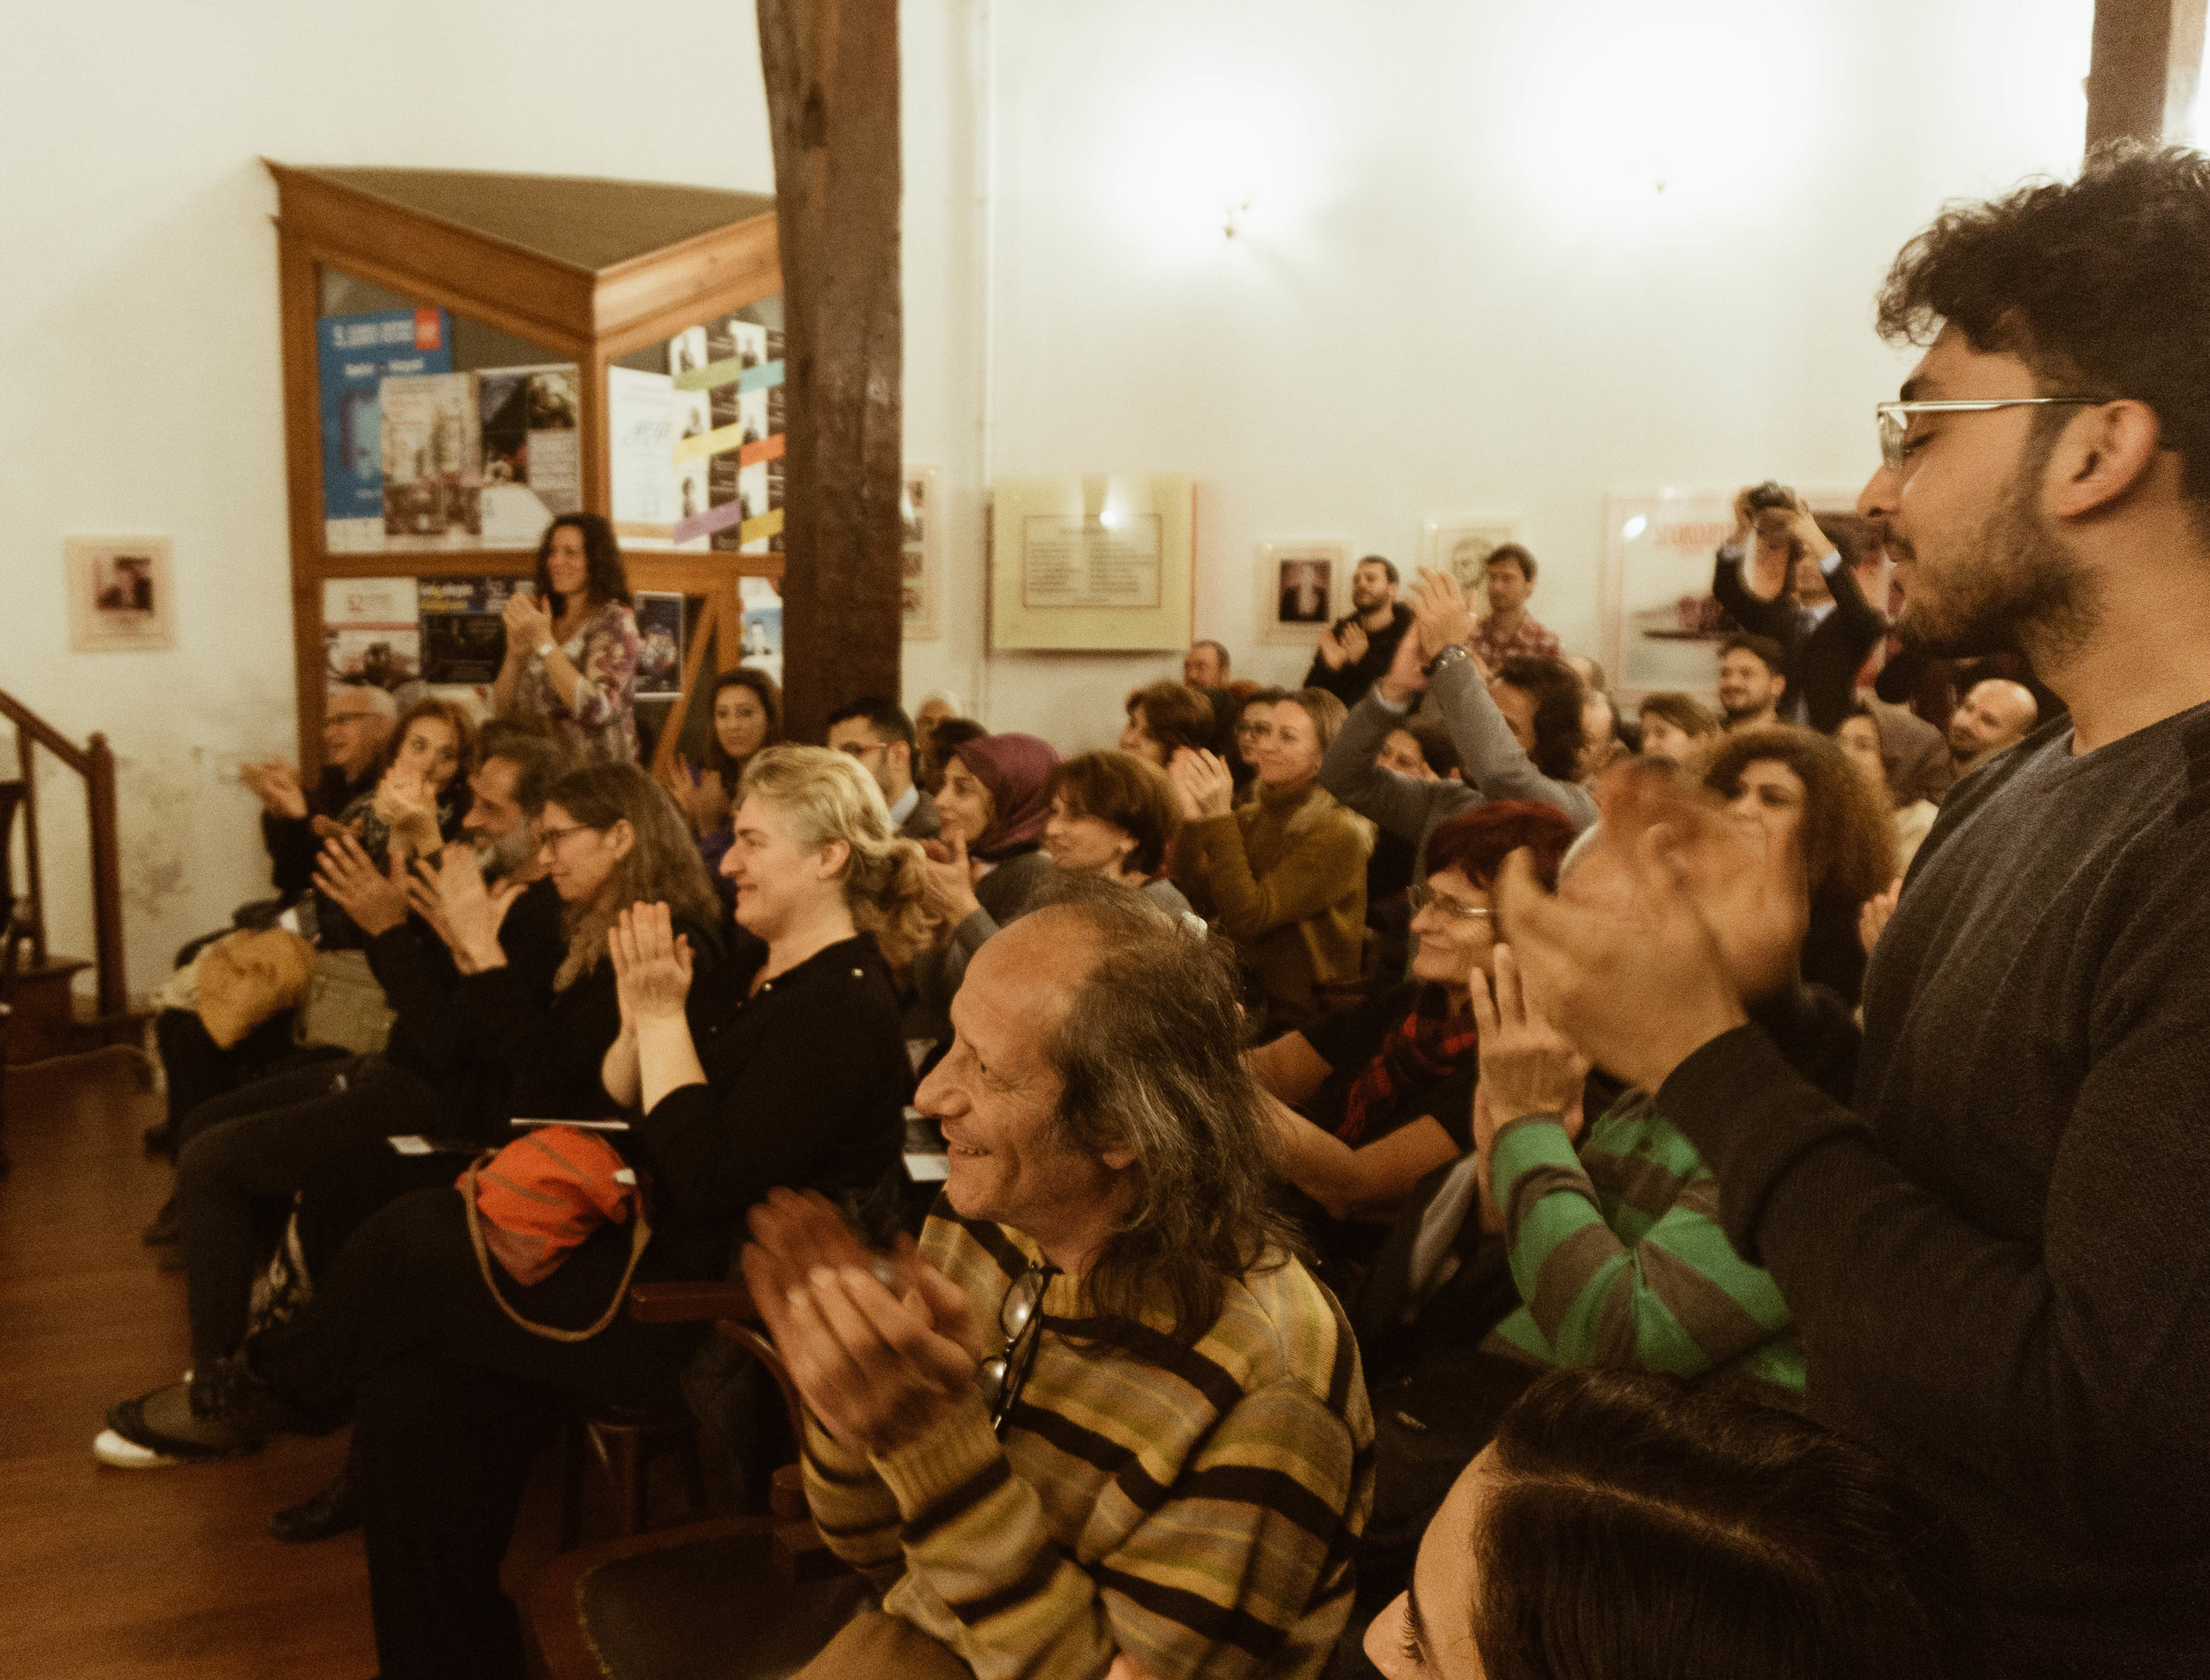 Raquy Danziger and Onder Cebeci - Classical Concert Crowd